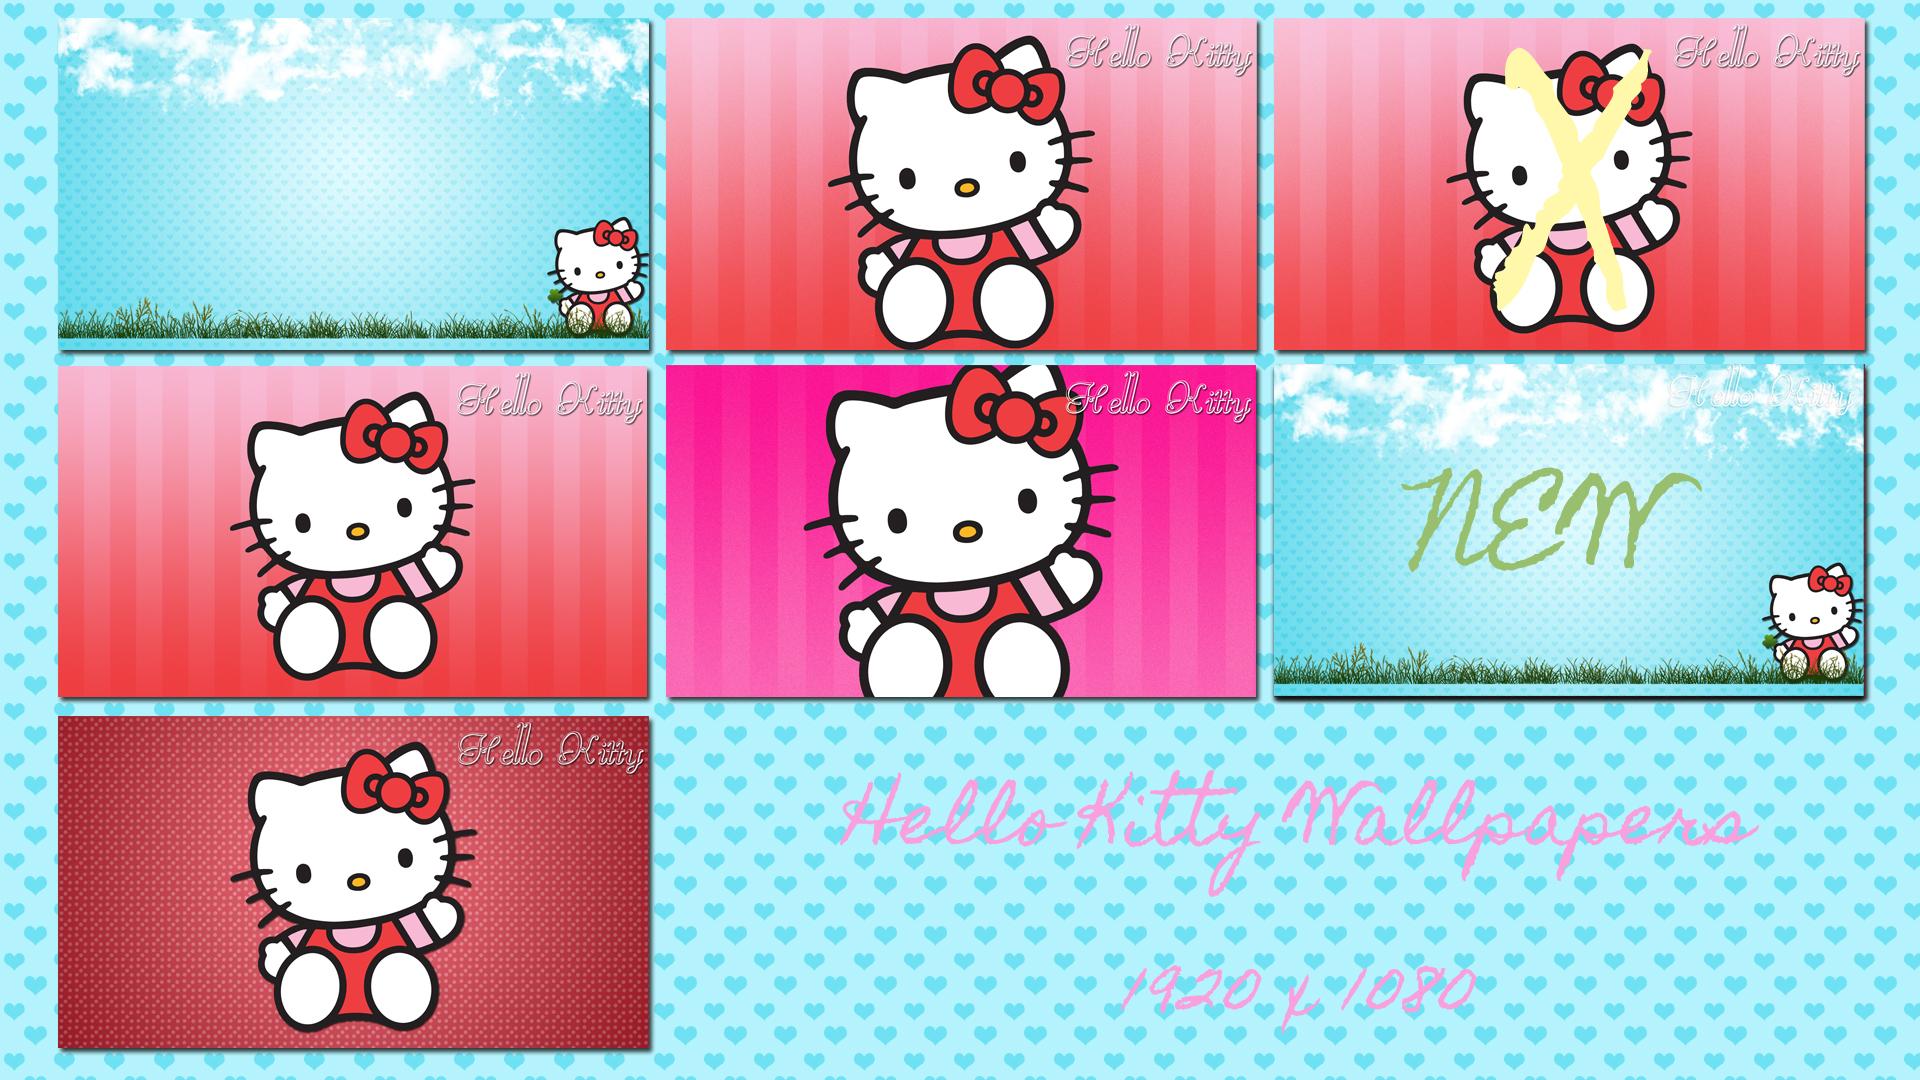 Cute Hello Kitty Desktop 6 Pack 1920 X 1080 By Sleepy